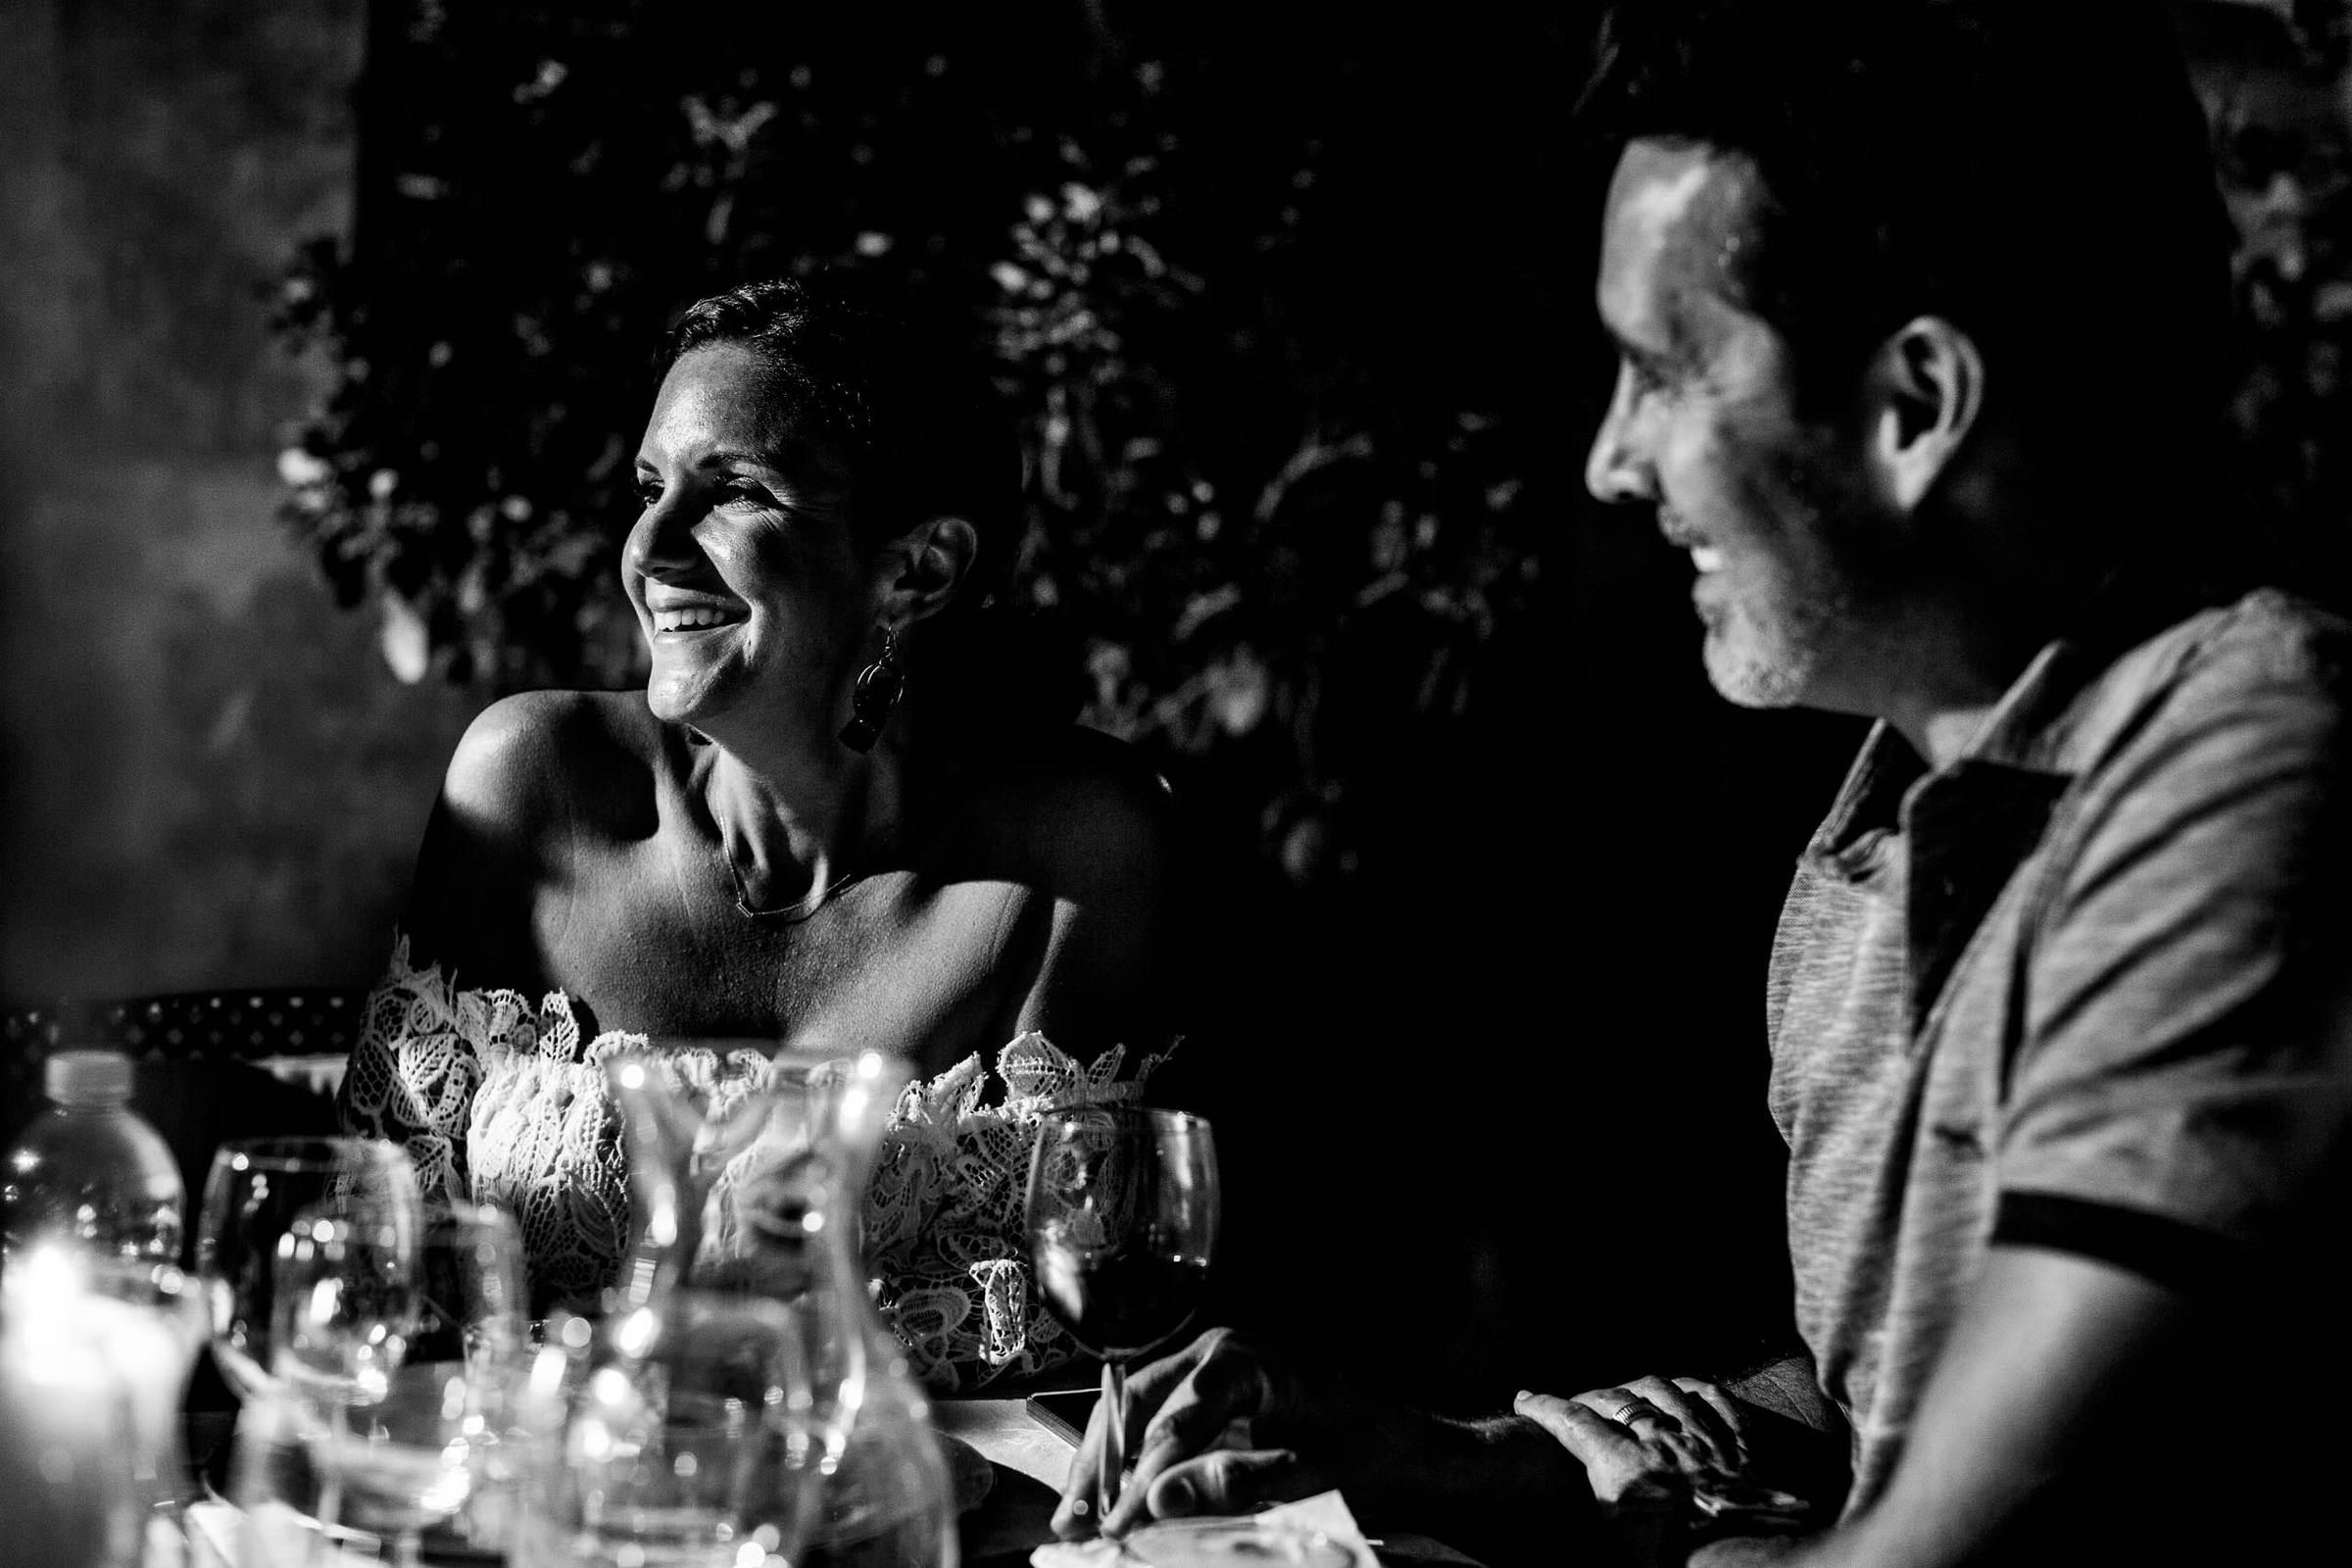 Bride and groom enjoying a reception dinner during a Villa Tre Grazie wedding celebration near Todi, Italy.